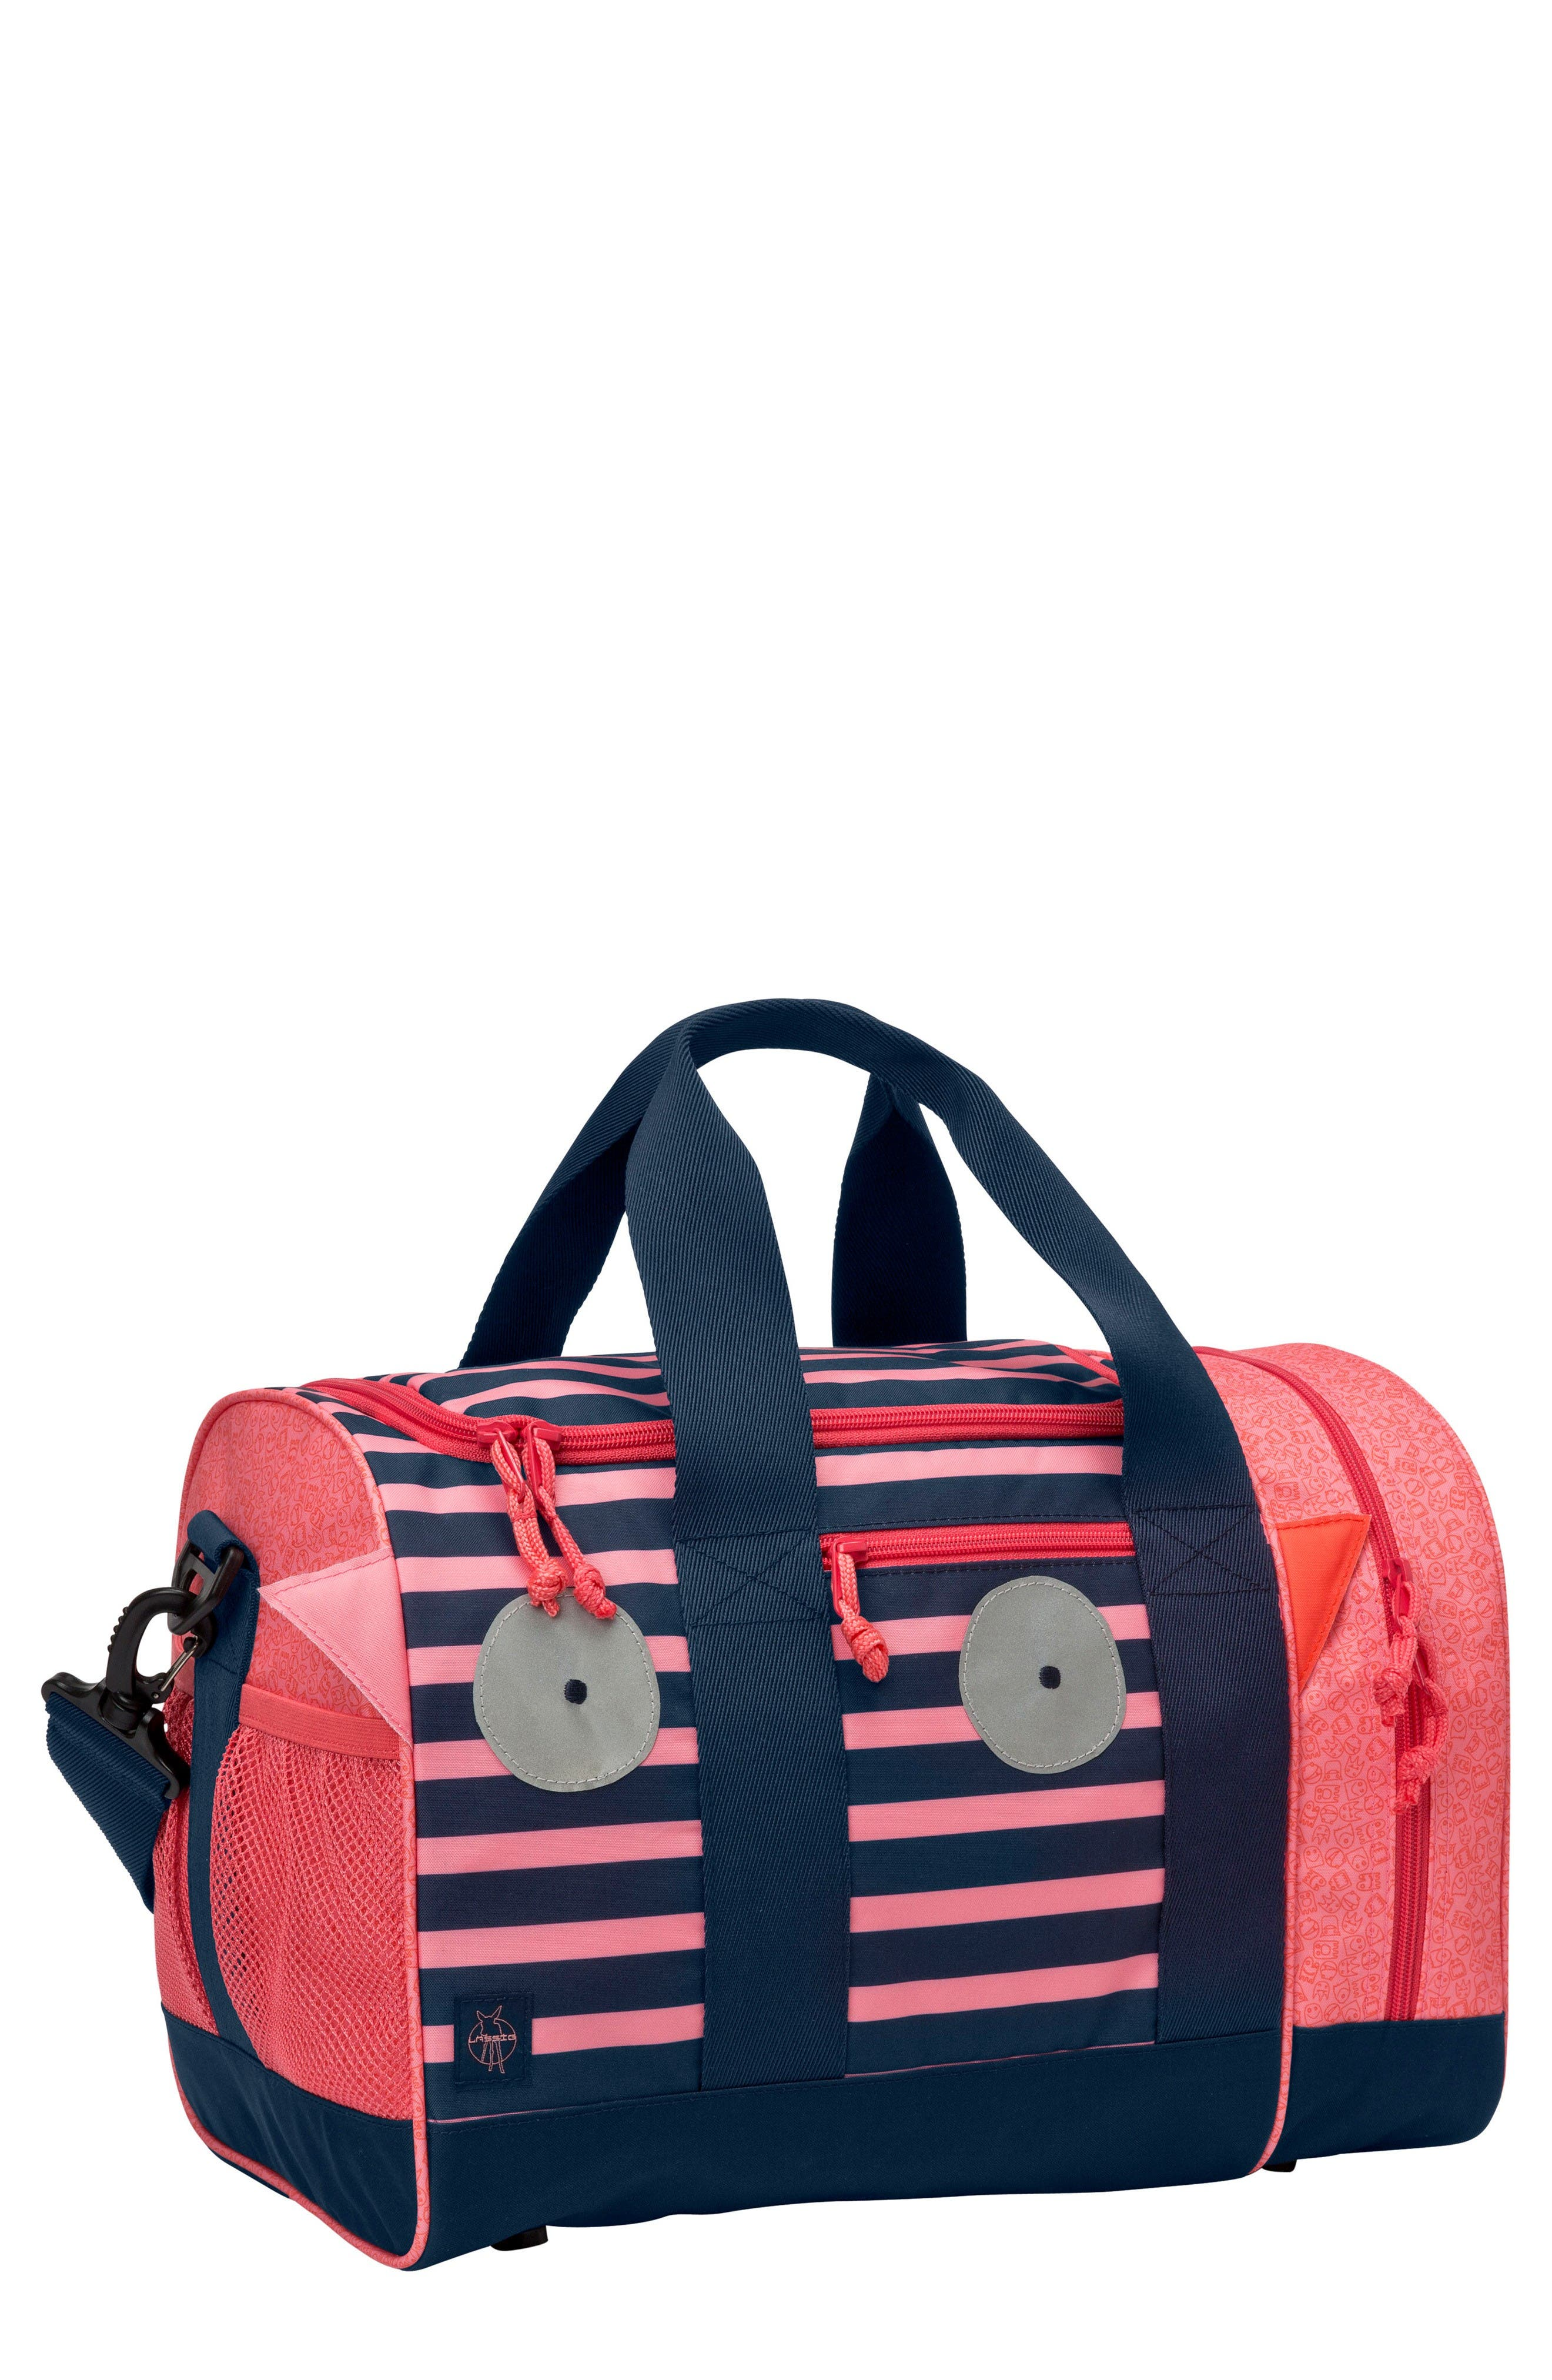 LÄSSIG Mini Sports Bag with Glow-in-the-Dark Eyes